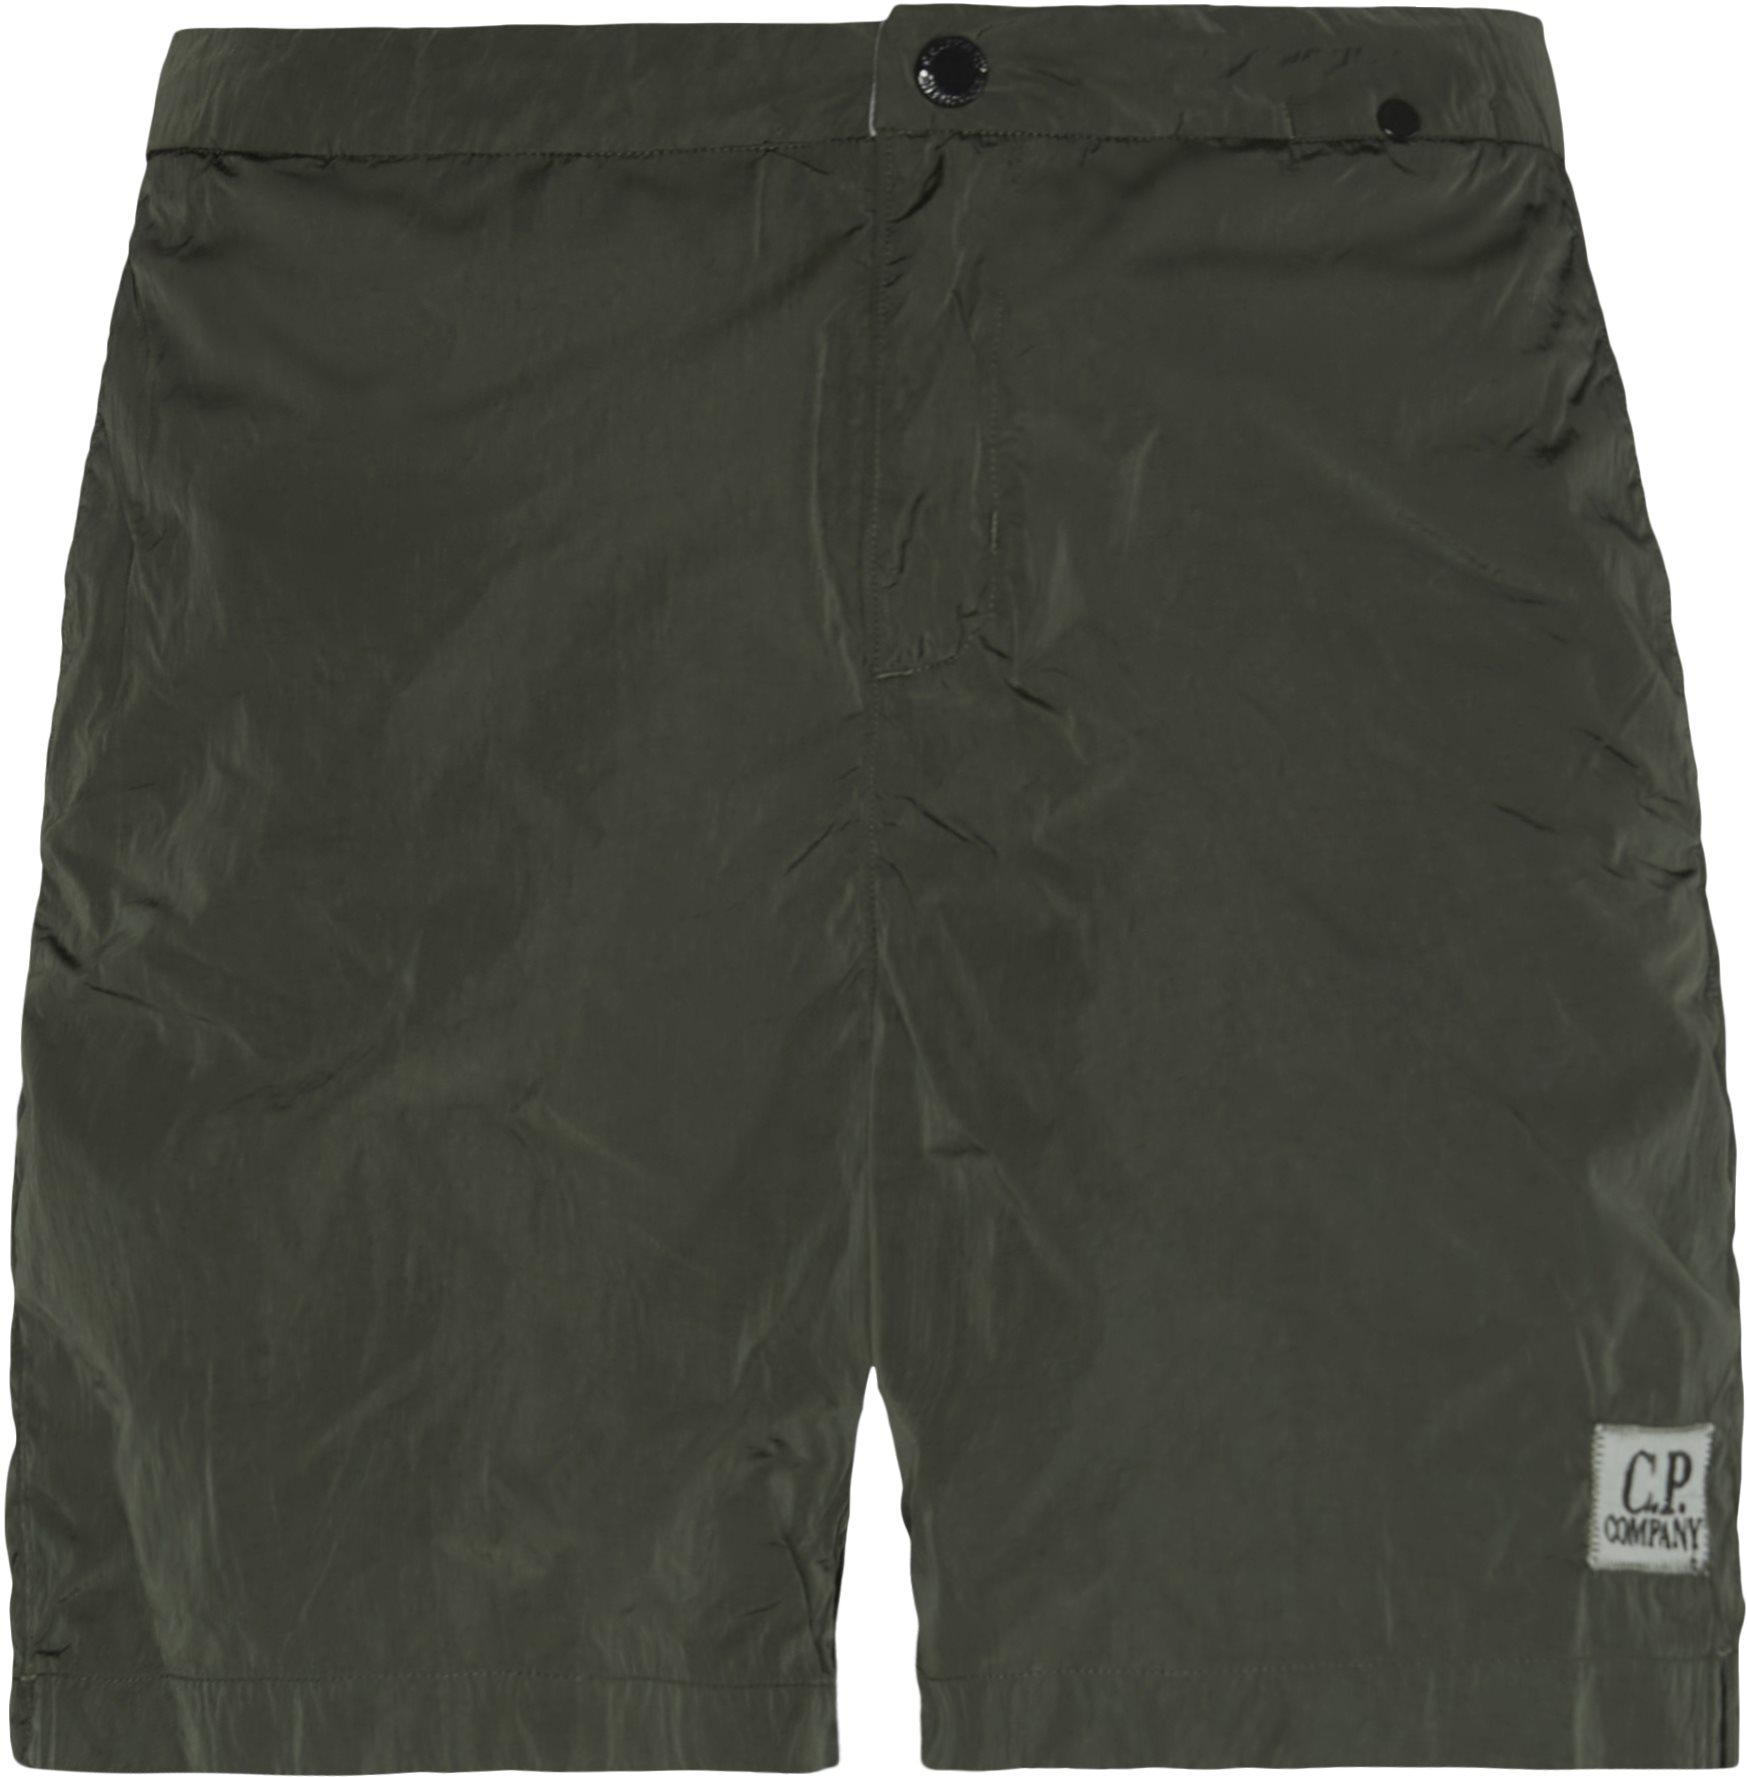 Shorts - Regular fit - Army